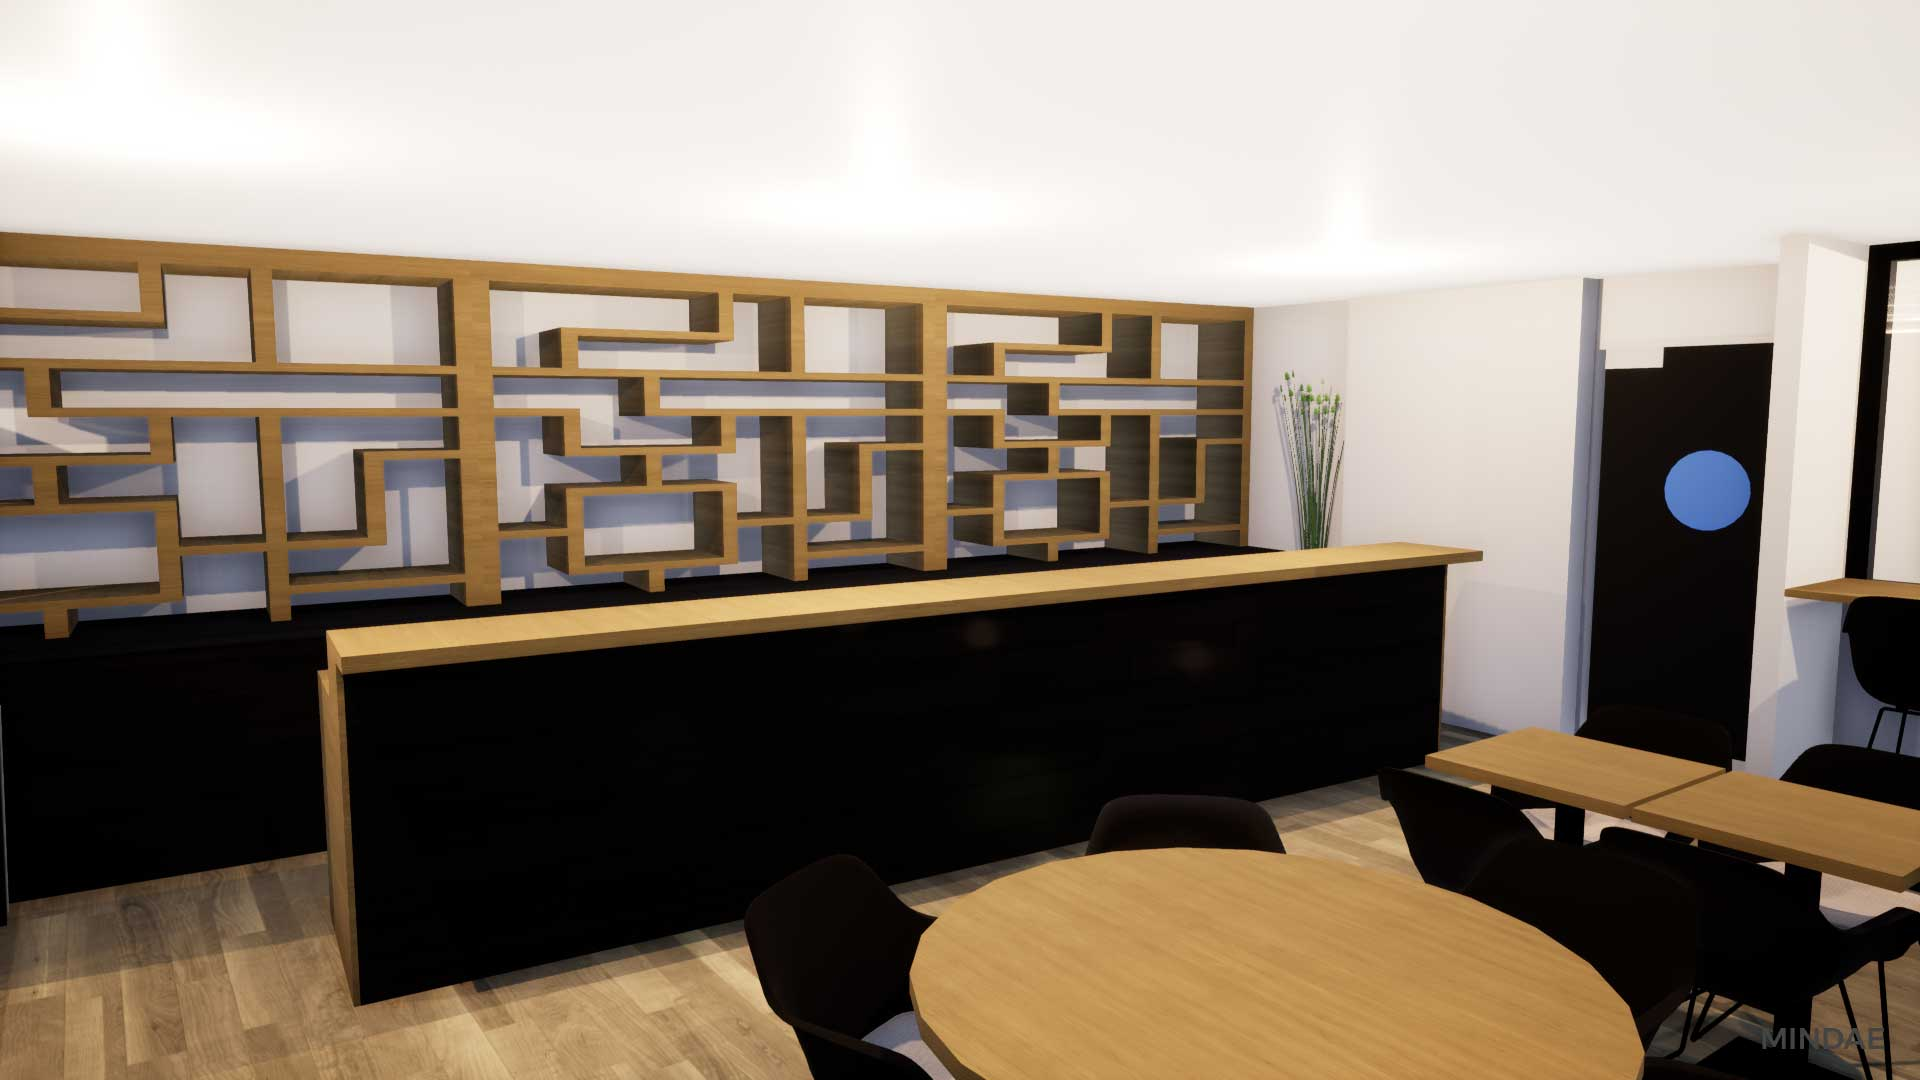 Mindae_3D_restaurant_caen_republique_agencement_bois_terrasse_comptoir-(8)